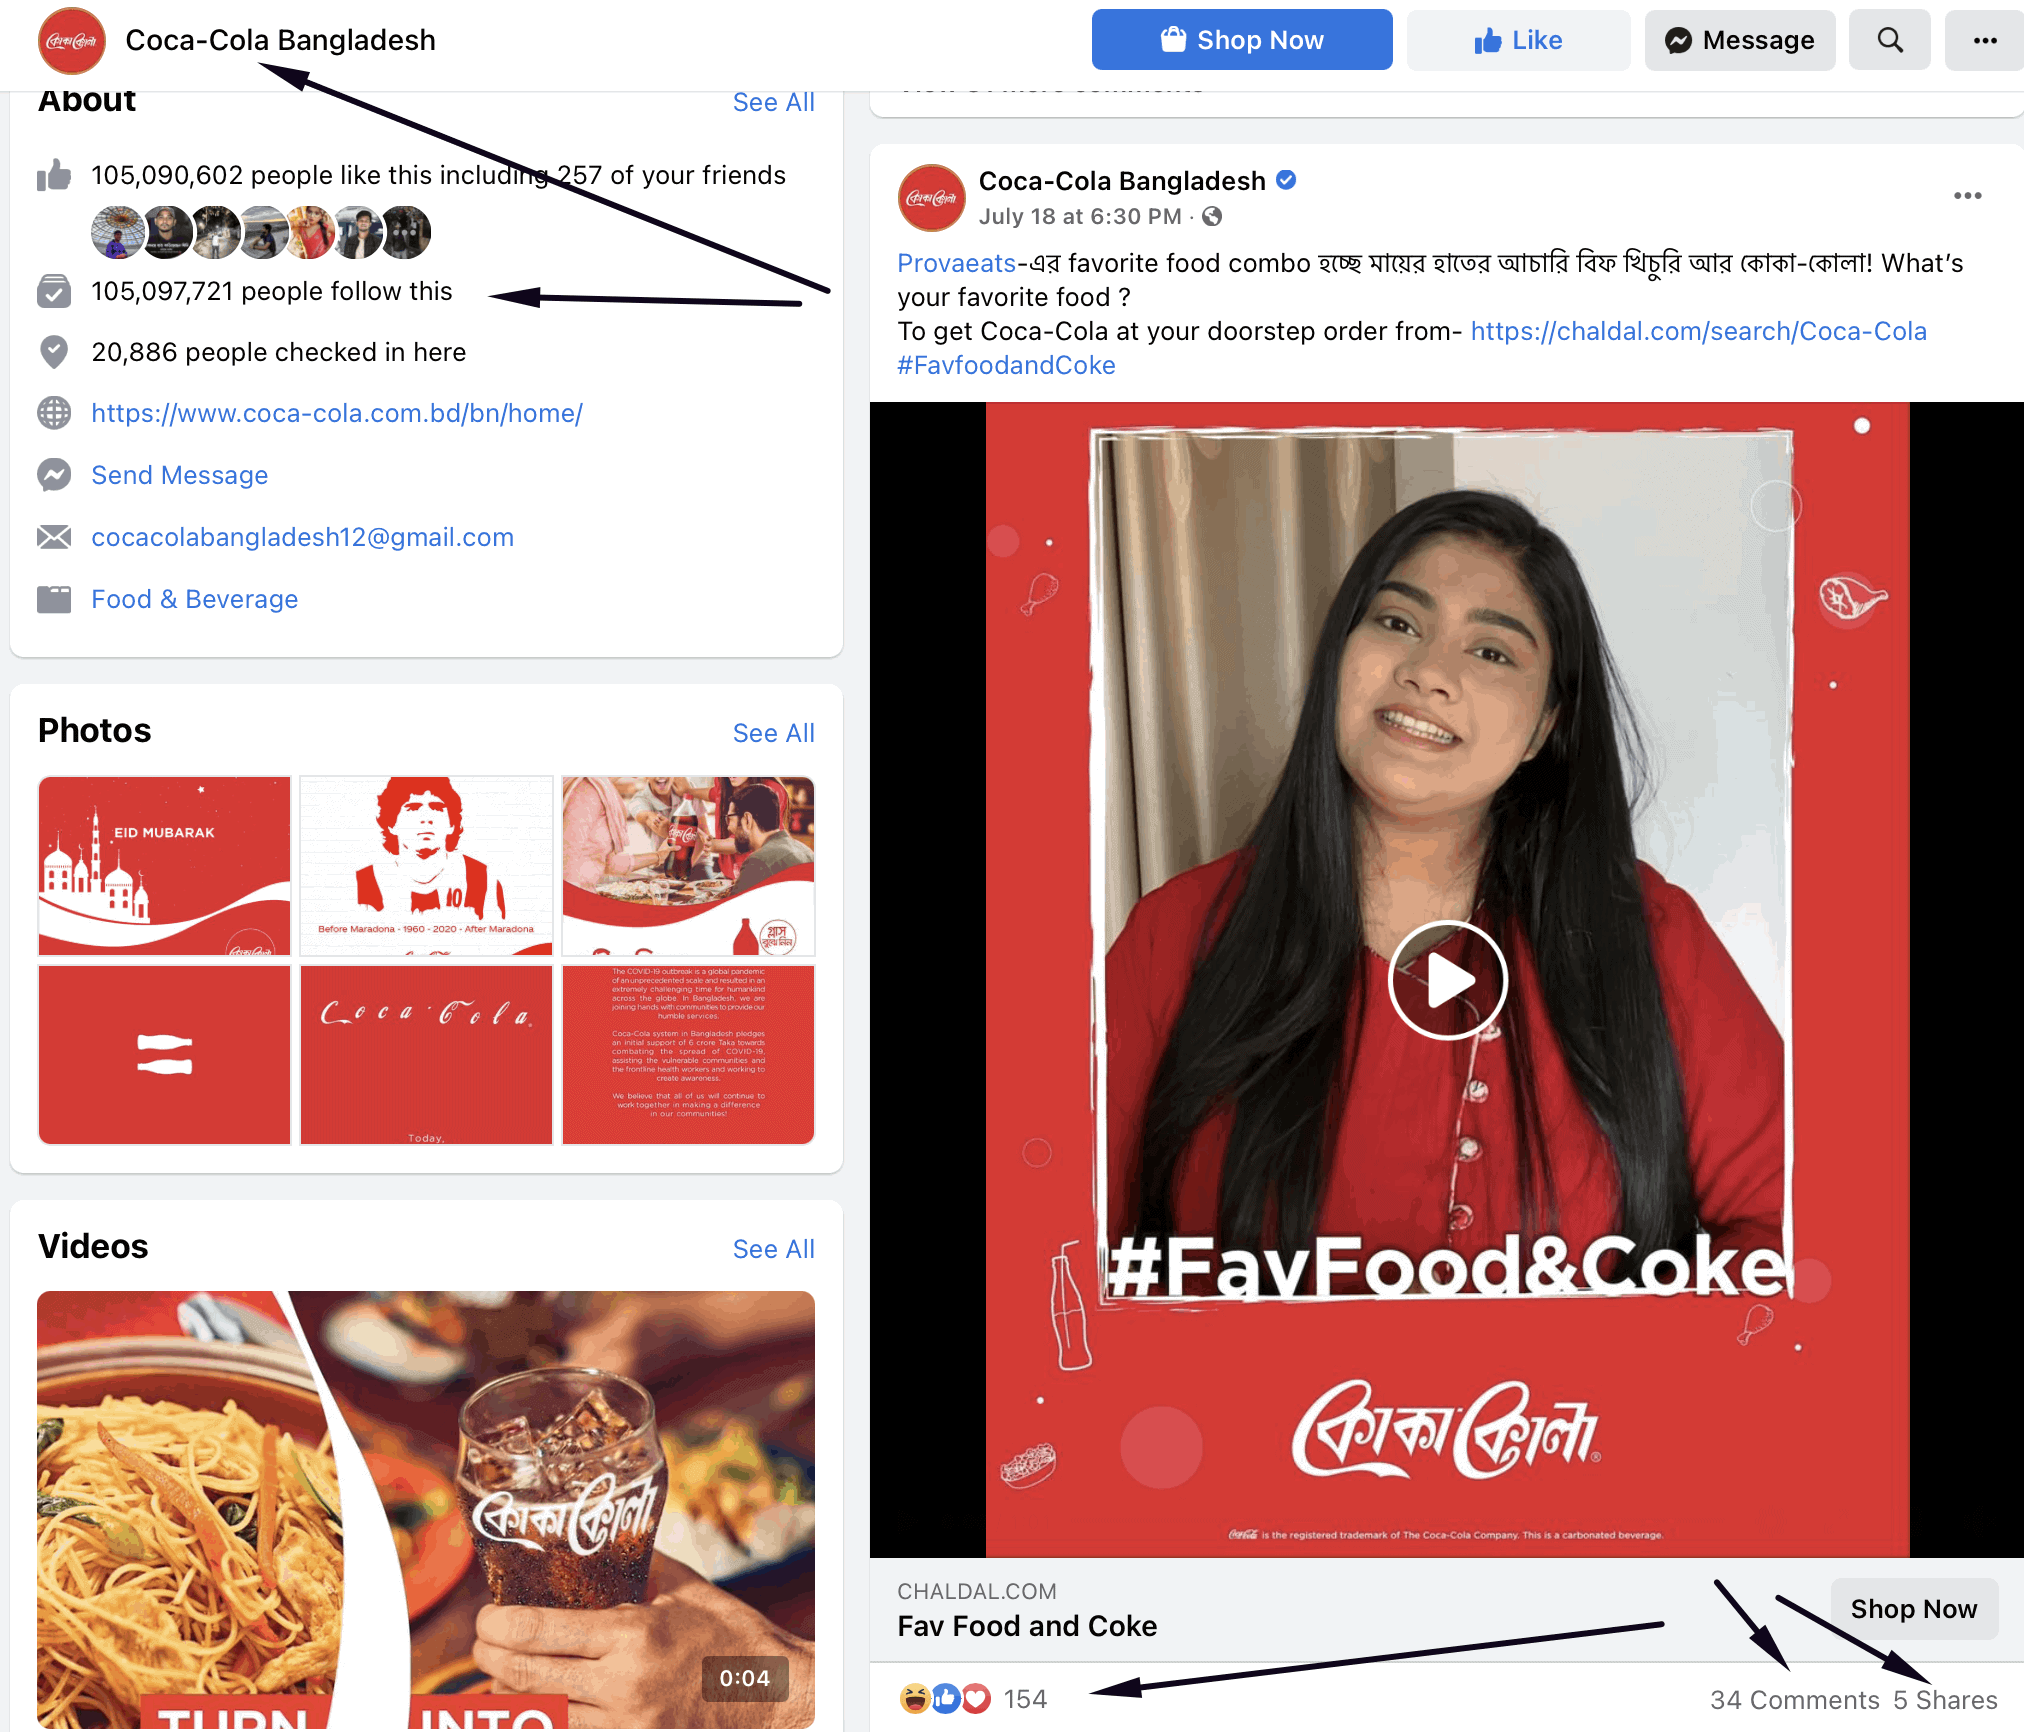 Cocacola Bangladesh Engagements